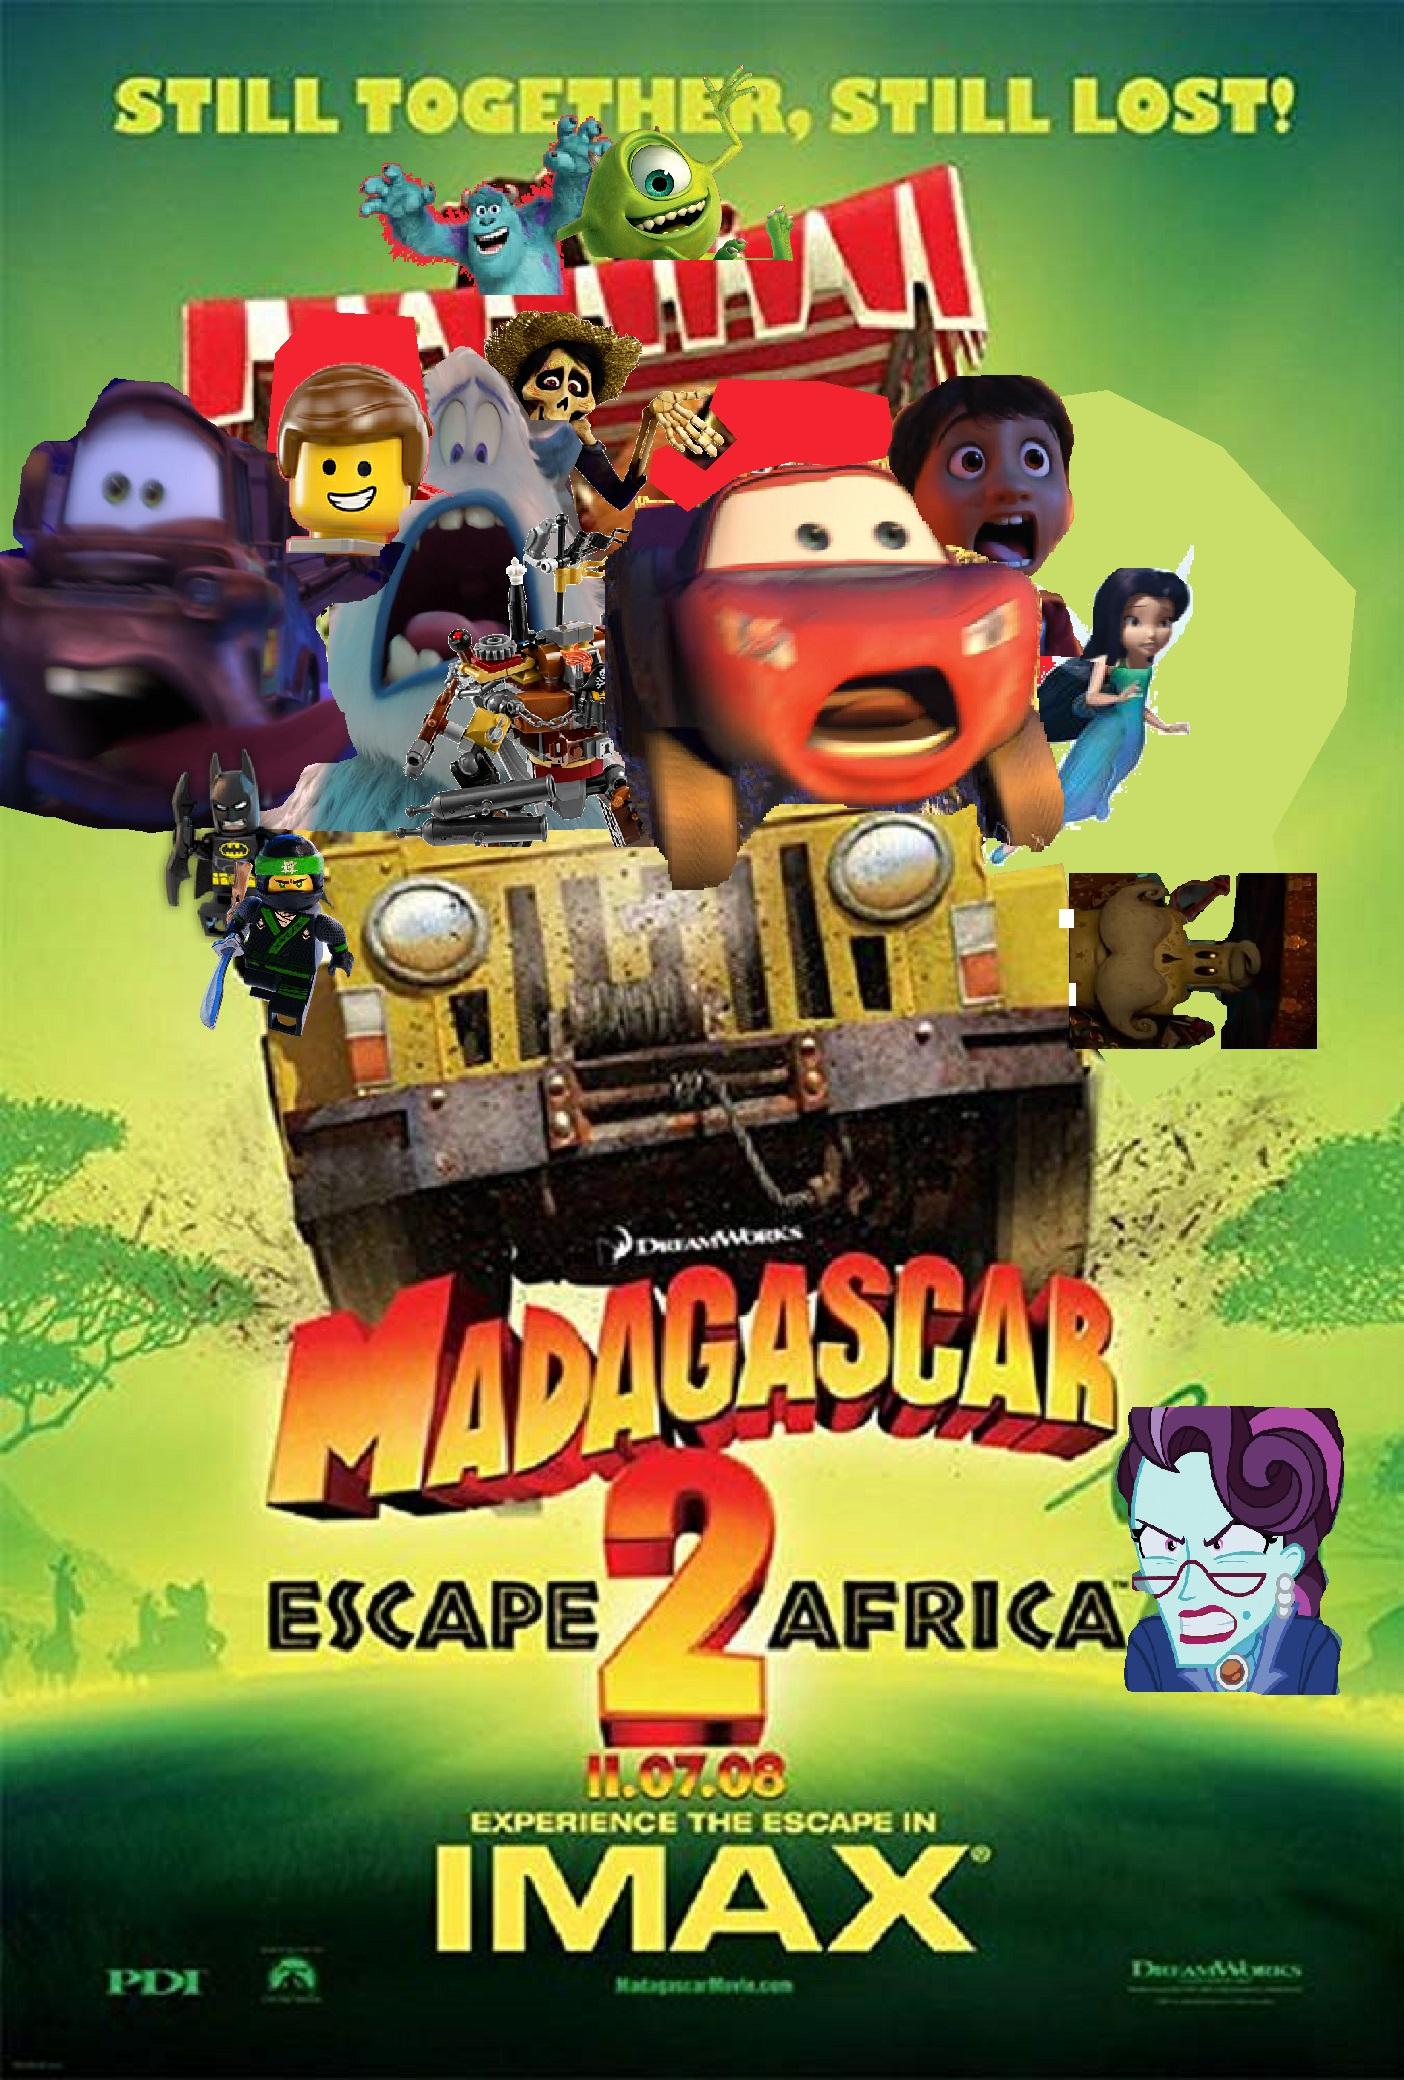 Madagascar Escape 2 Africa Luis Alberto Videos Galvan Ponce Style The Parody Wiki Fandom